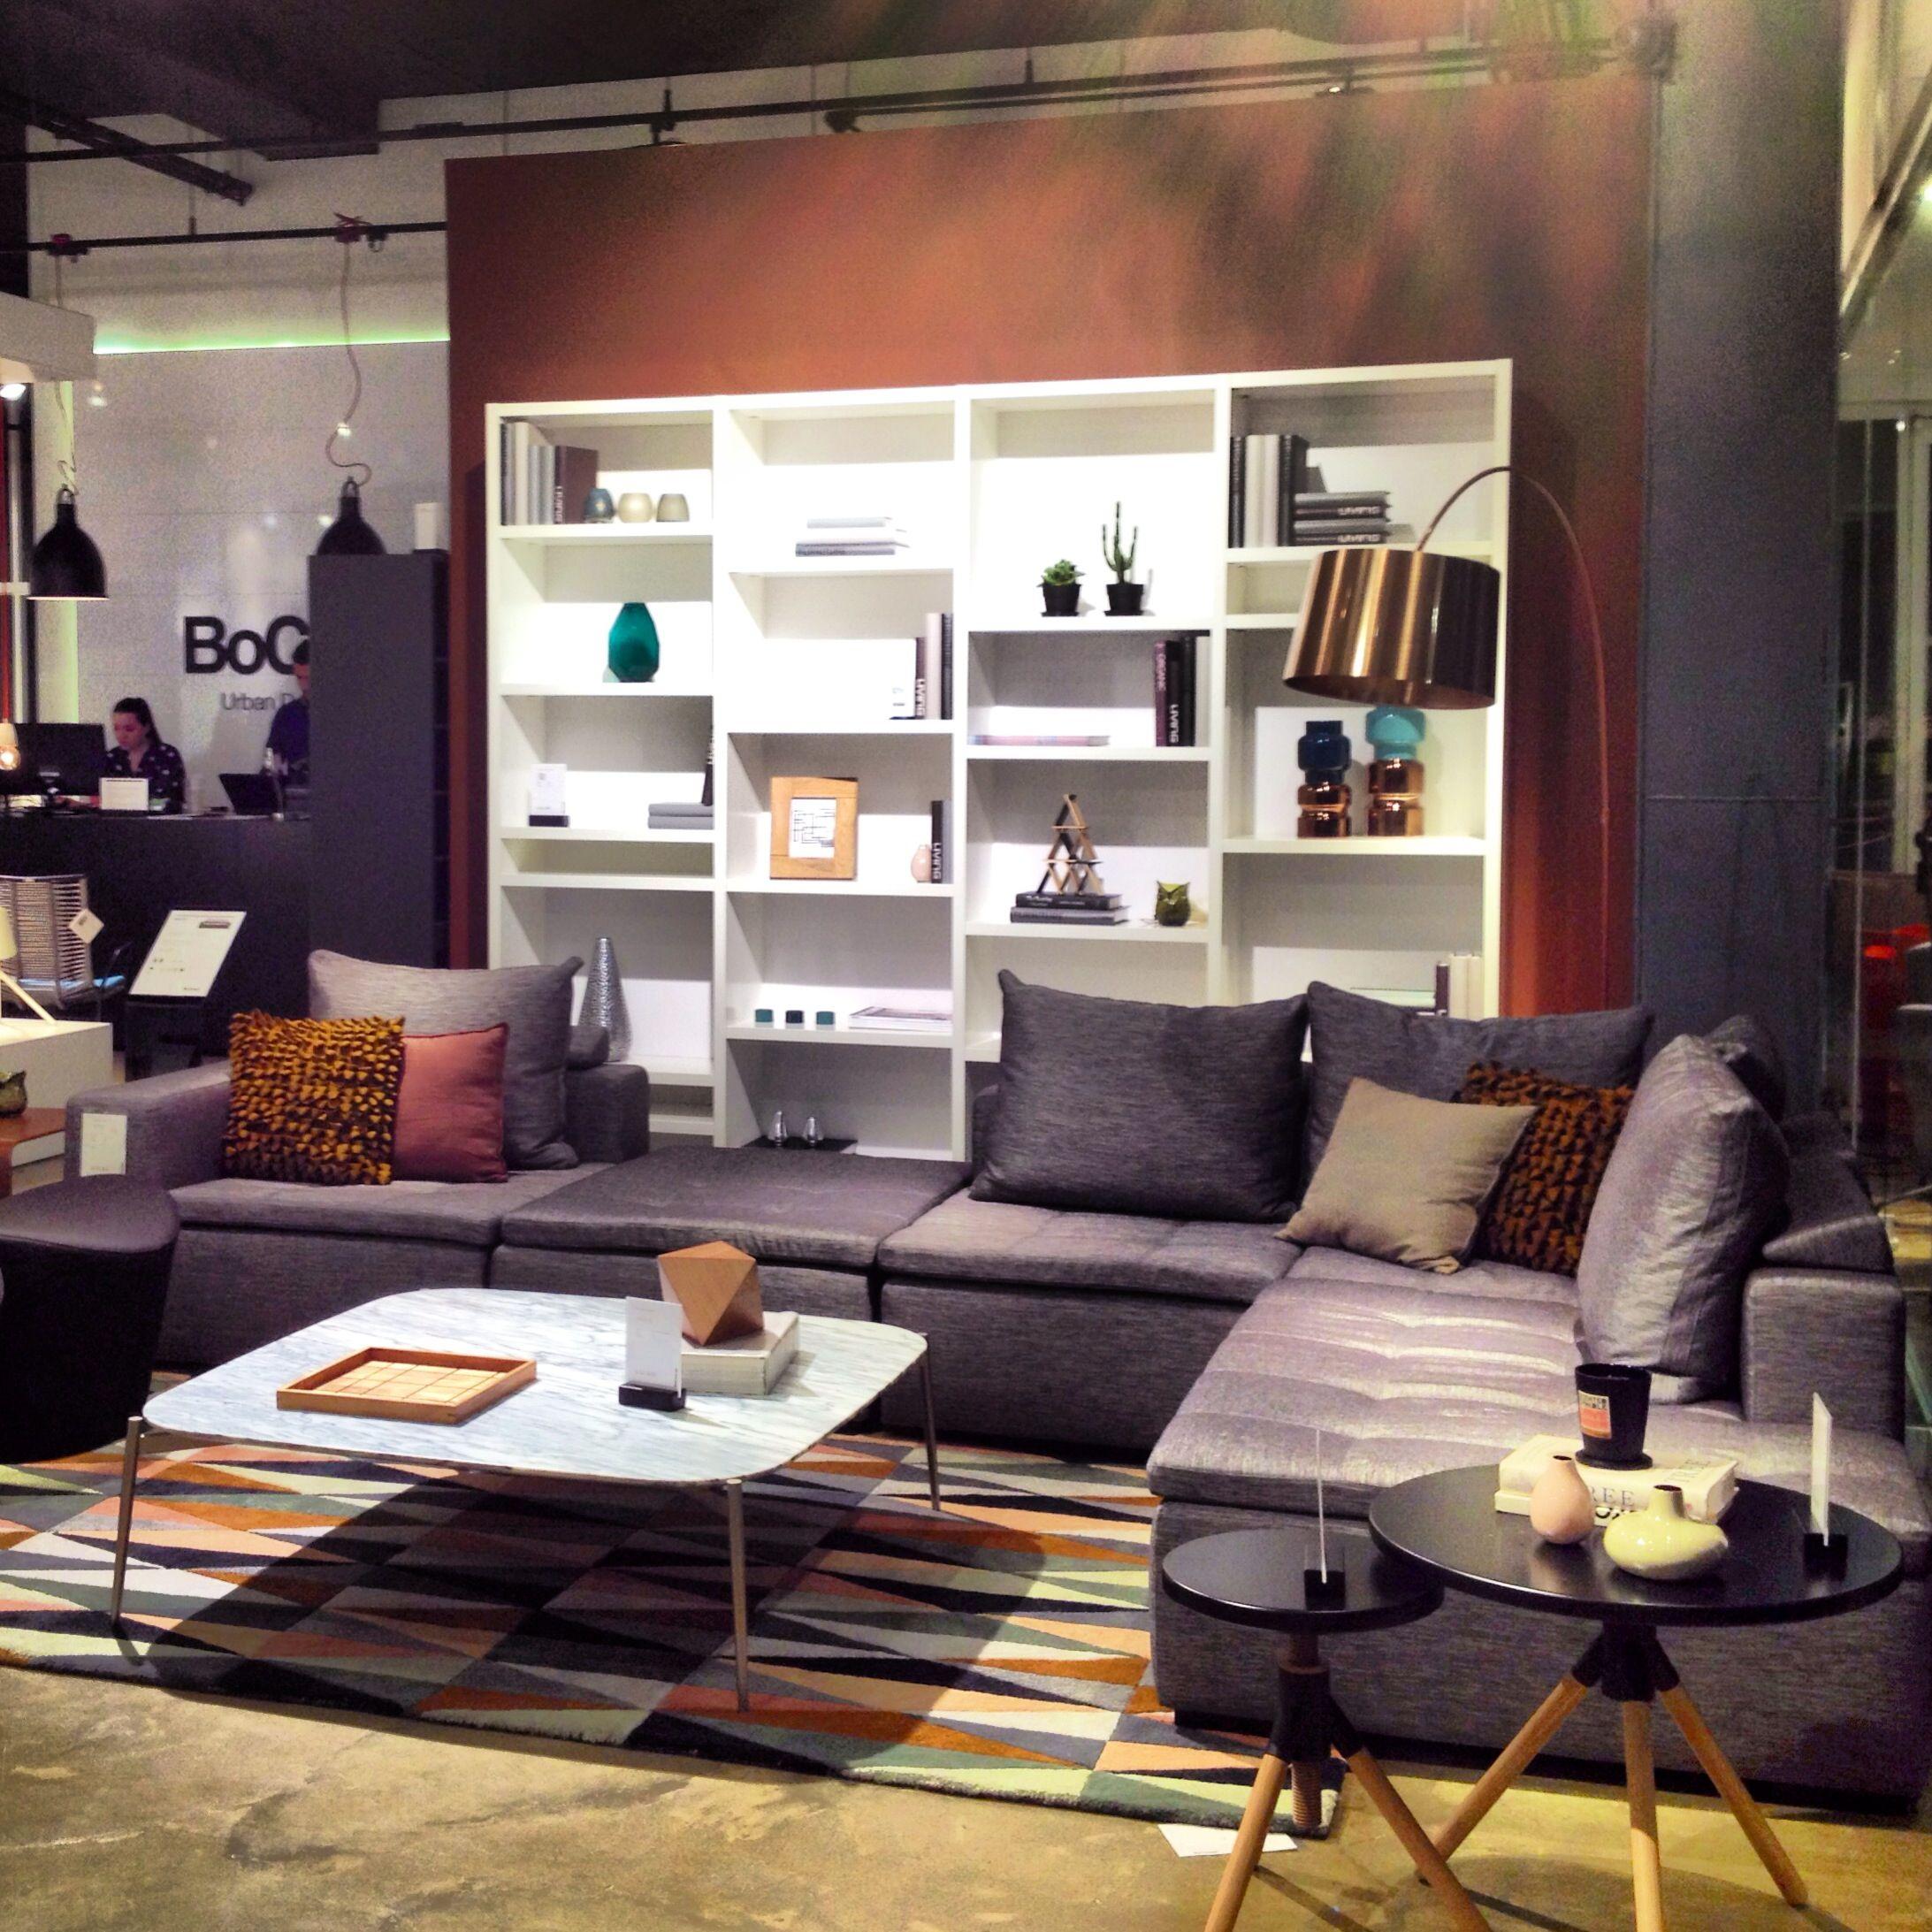 Sofa Retailers Glasgow Cheap Sofas Okc Boconcept Mezzo Lecco Bookshelf And Kuta Copper Lamp